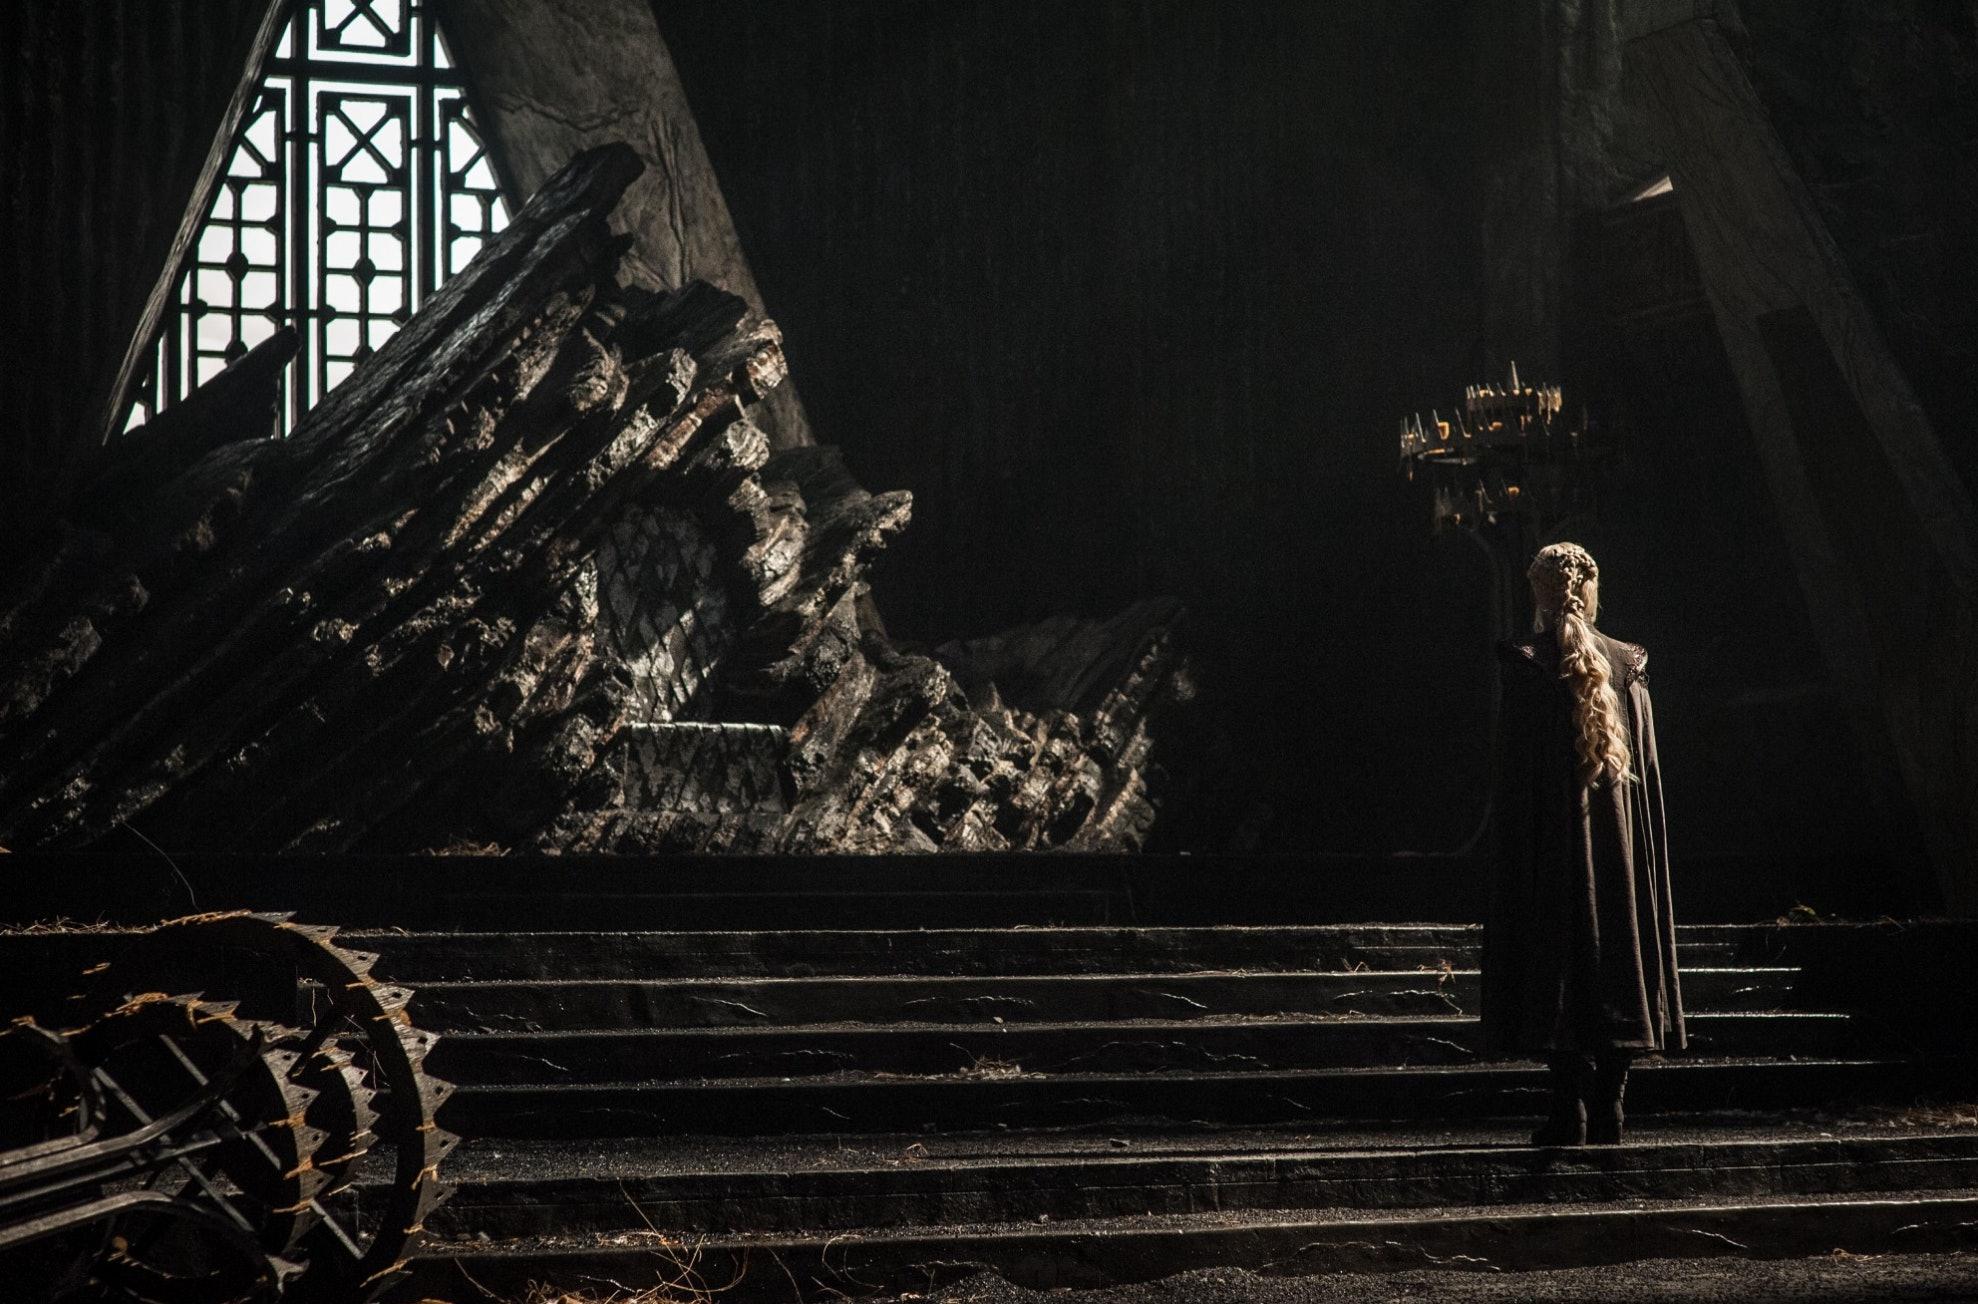 Emilia Clarke as Daenerys Targaryenin 'Game of Thrones' Season 7